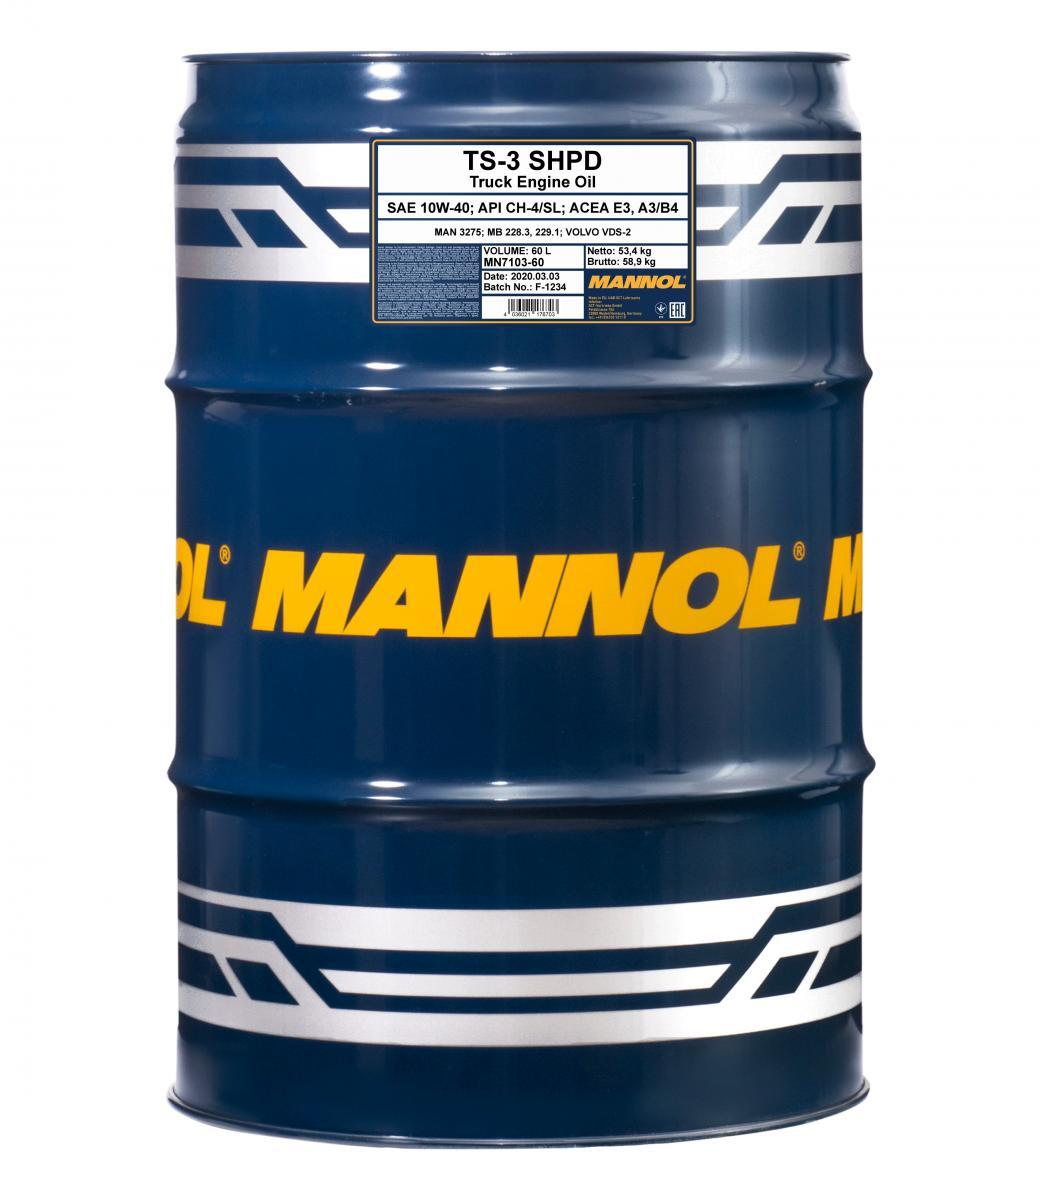 MN7103-60 MANNOL TS-3, SHPD 10W-40, 10W-40, 60l Motoröl MN7103-60 günstig kaufen